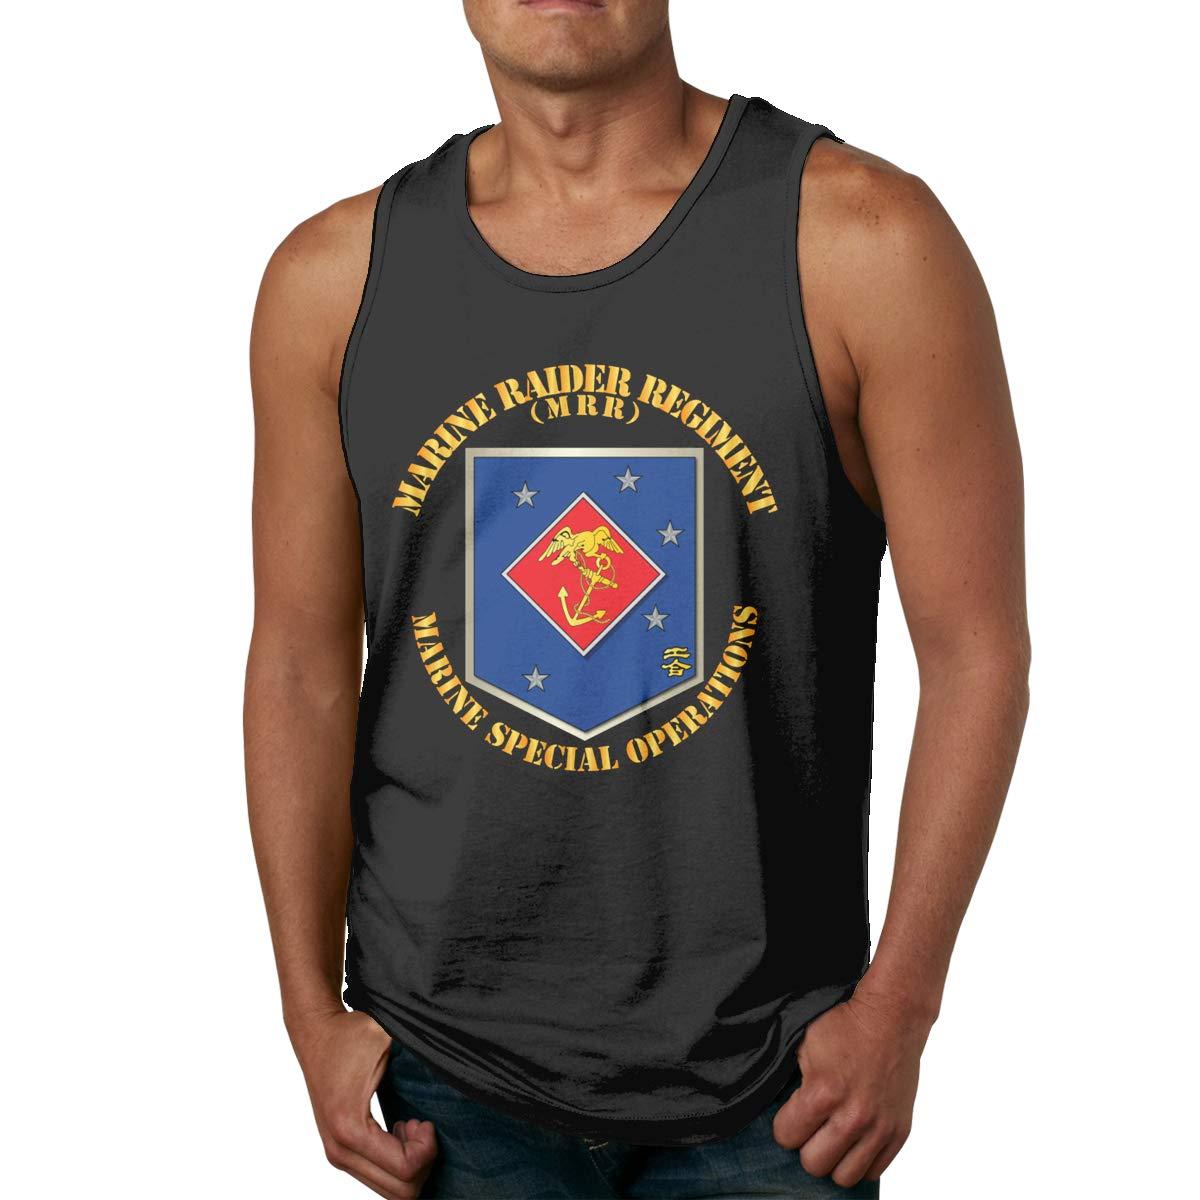 USMC Marine Raider Regiment Mens Cotton Undershirts Crew Neck Tank Tops